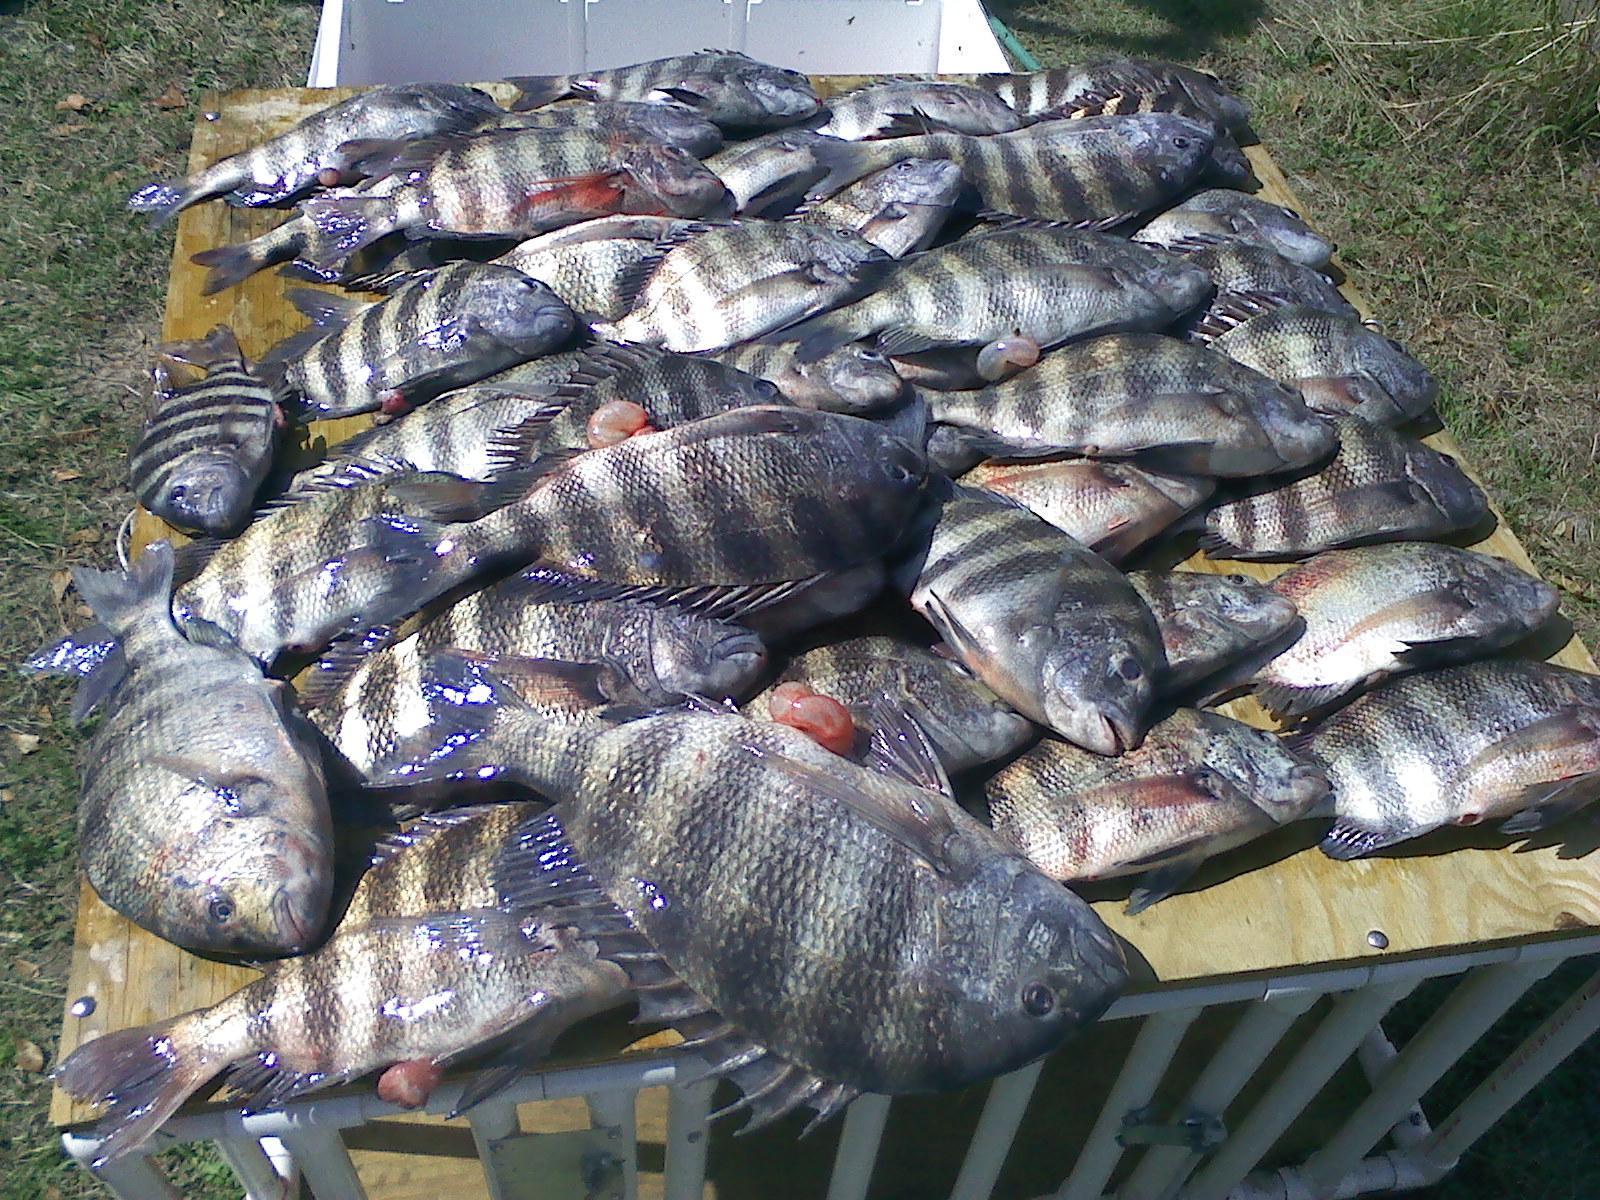 Coastal Georgia and St. Simons Island Charter Fishing Are Saltwater Sheepshead Fish Good To Eat